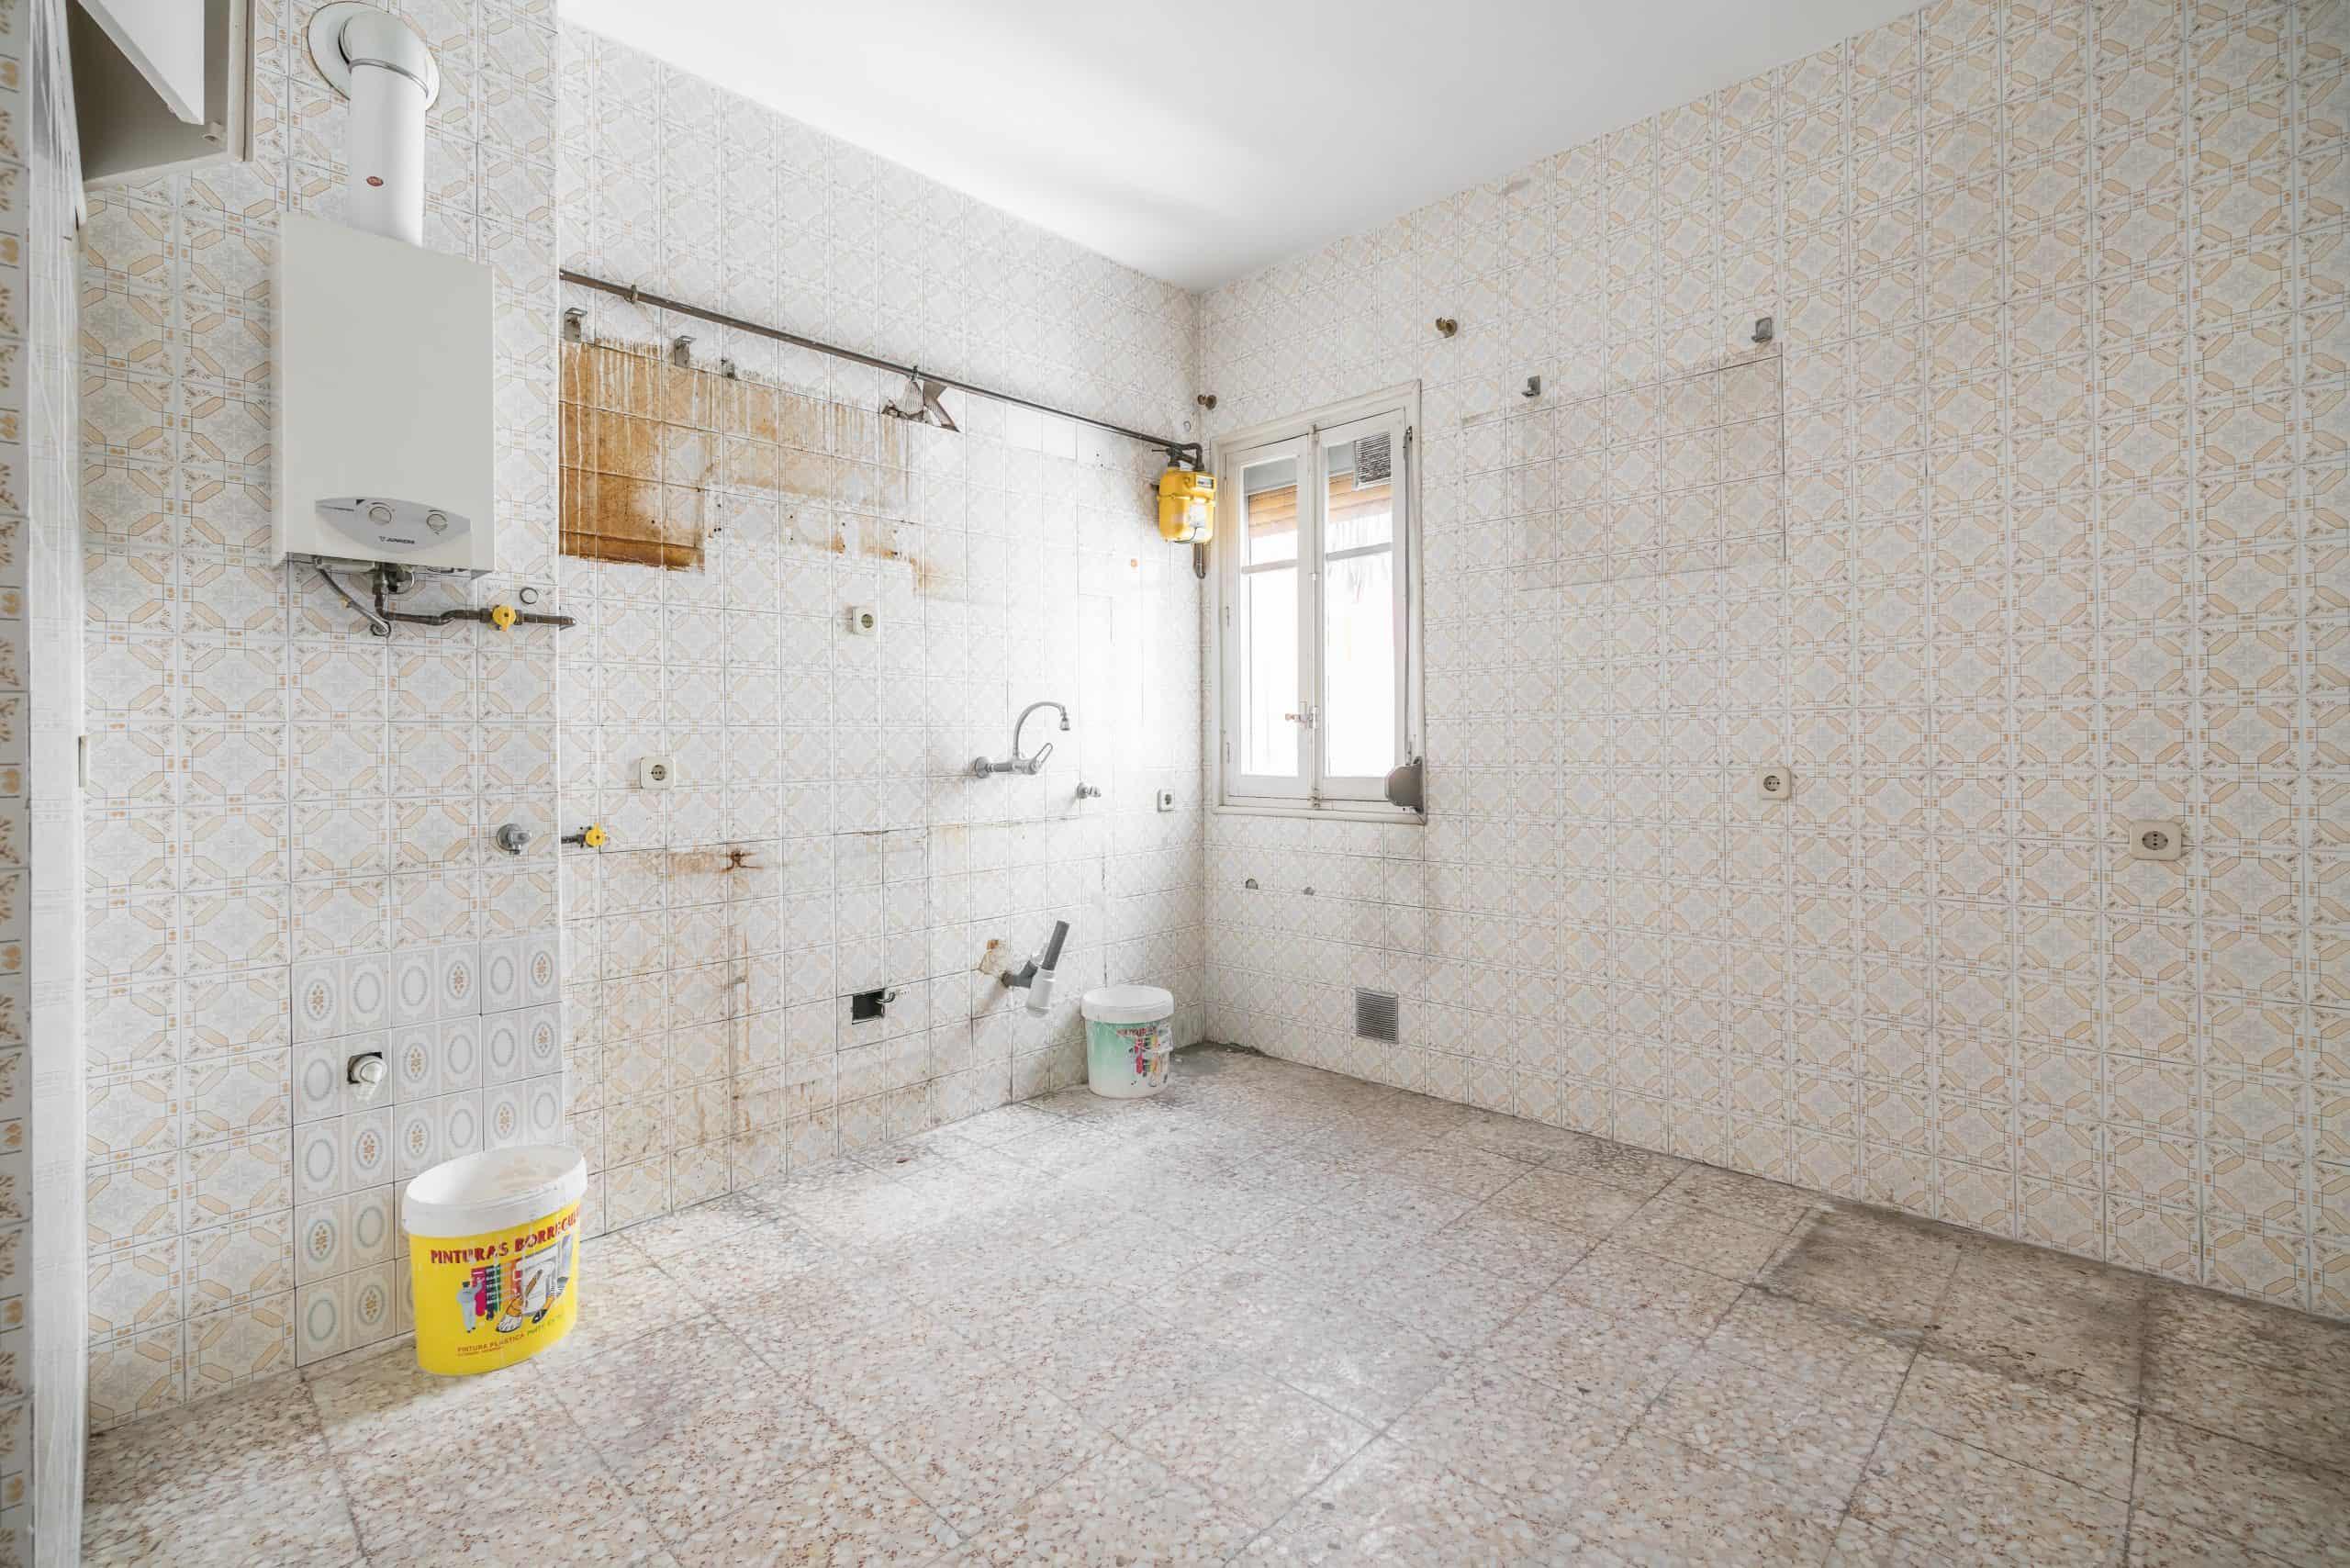 Agencia Inmobiliaria de Madrid-FUTUROCASA-Zona ARGANZUELA-EMBAJADORES-LEGAZPI -calle ALEJANDRO FERRANT -COCINA